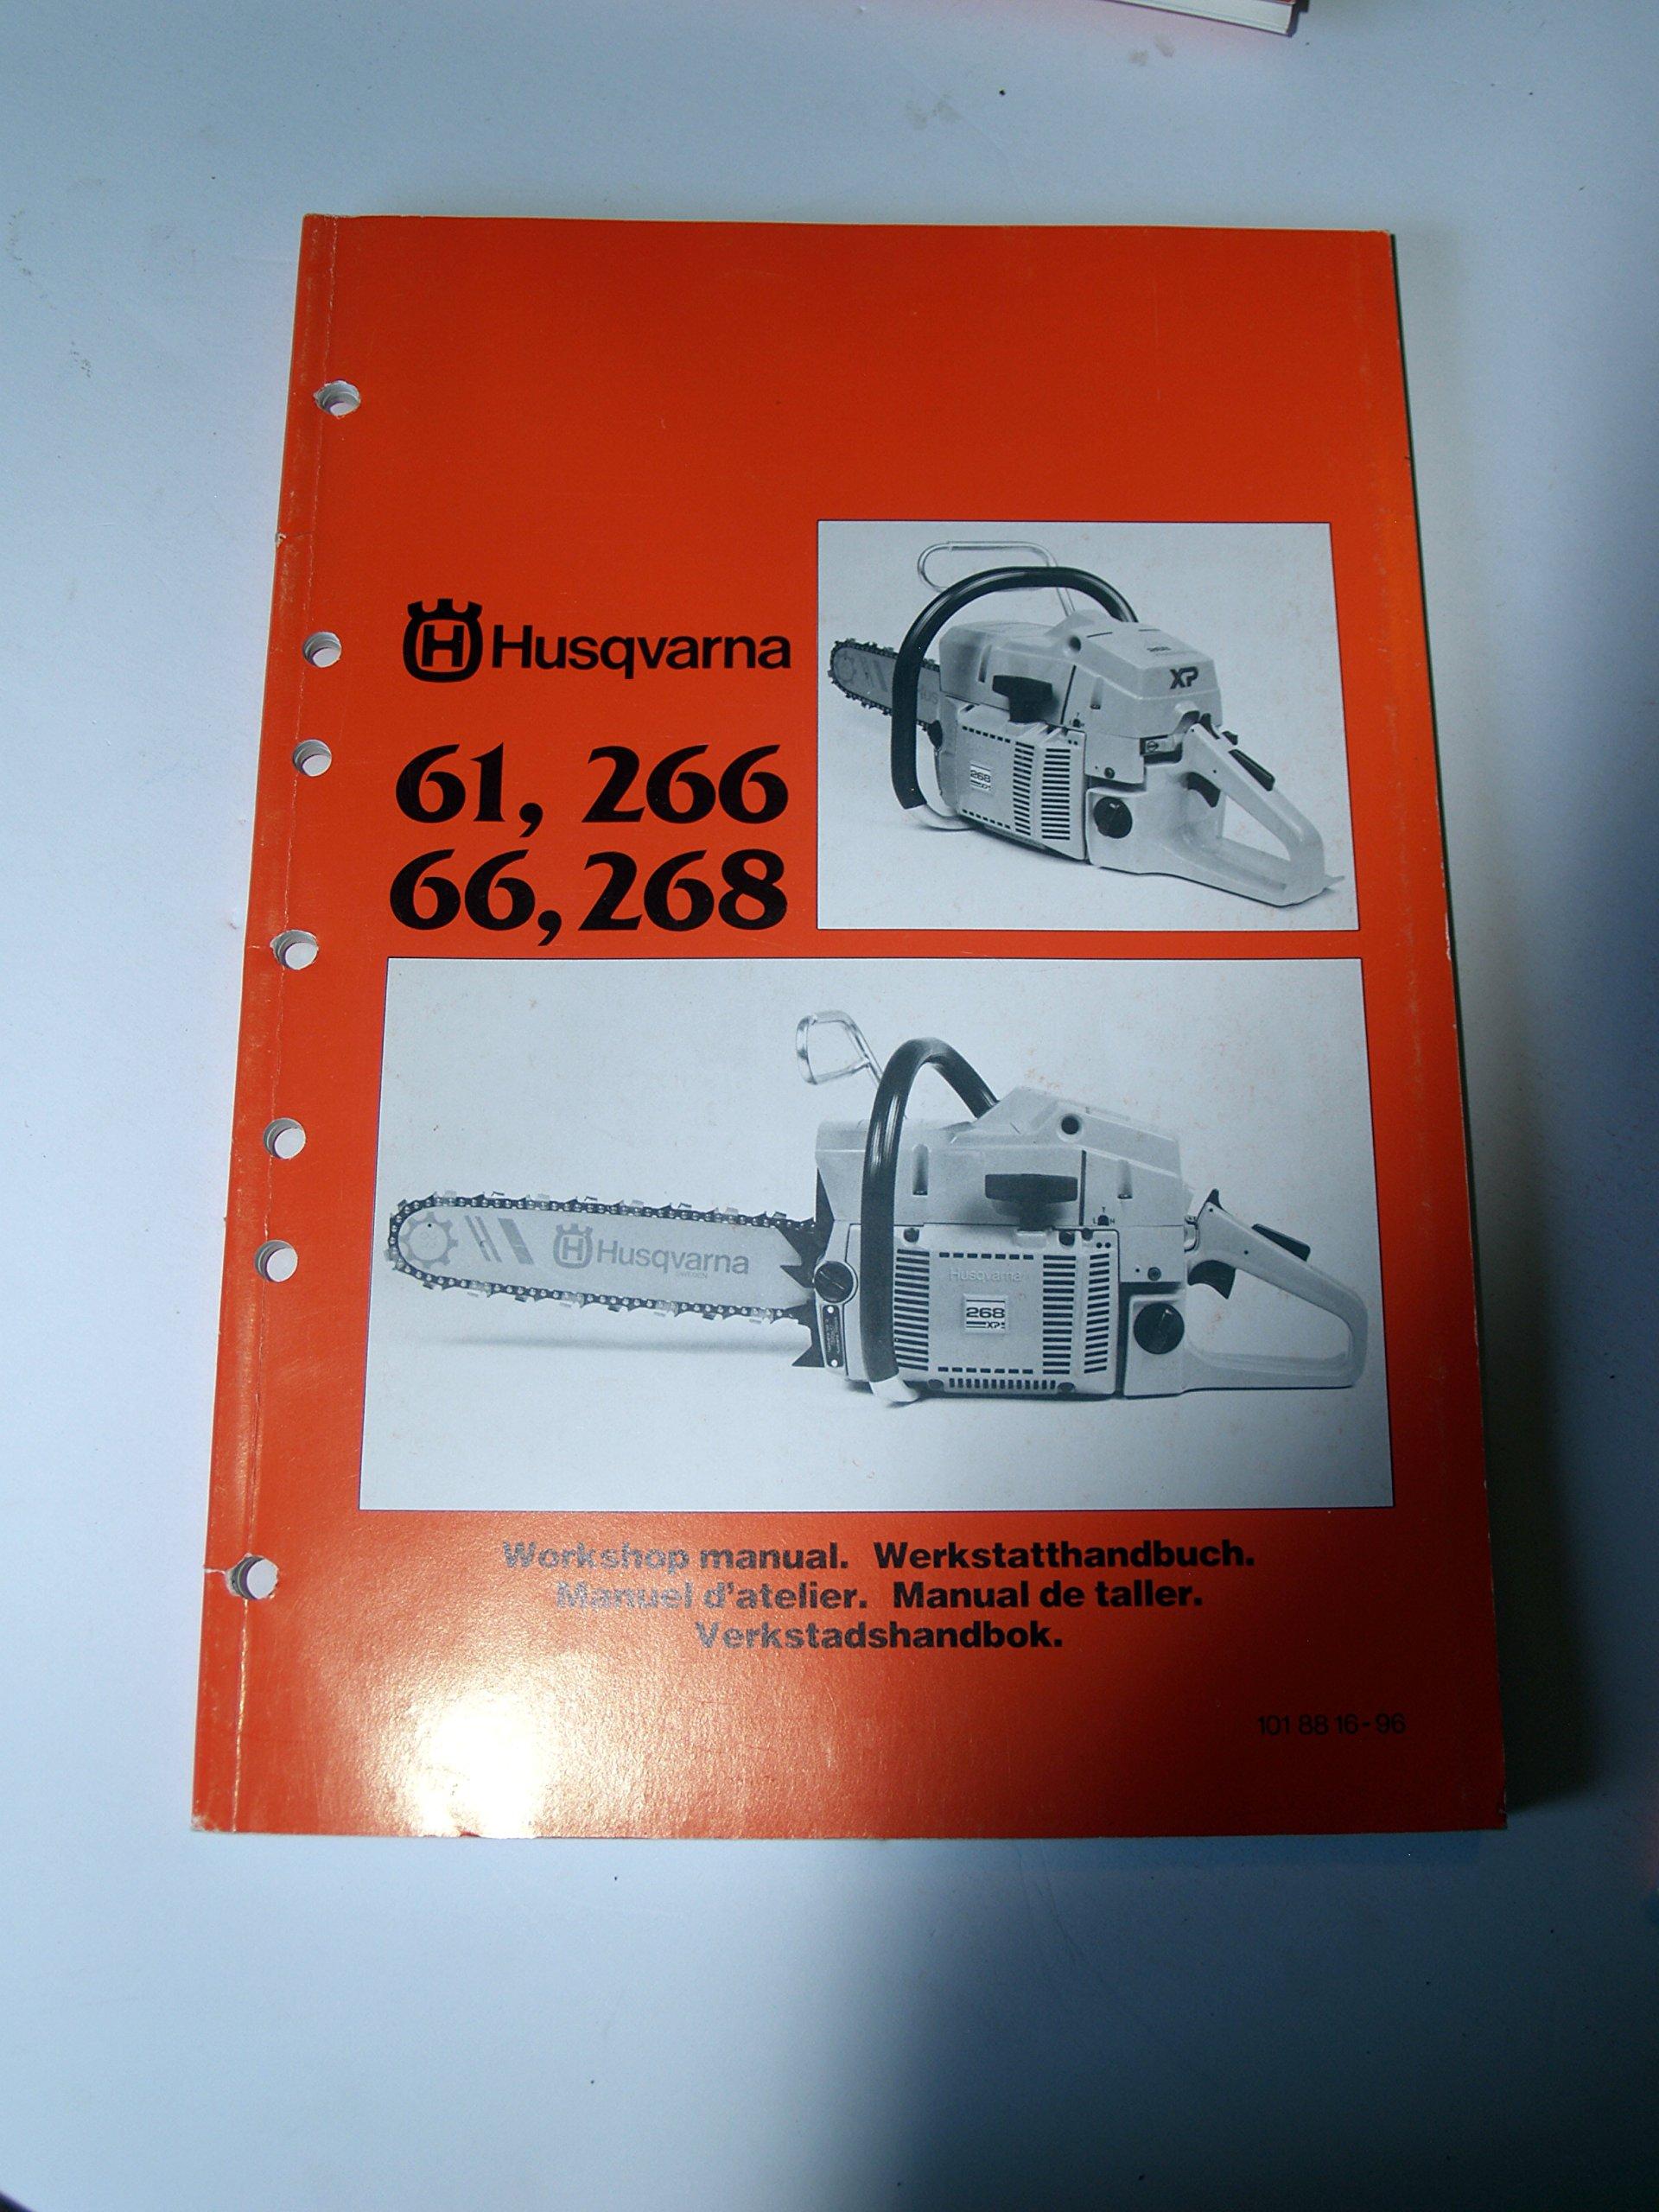 Husqvarna 61 266 66 268 Chain Saw Workshop Service Manual: Husqvarna:  0739718157392: Amazon.com: Books